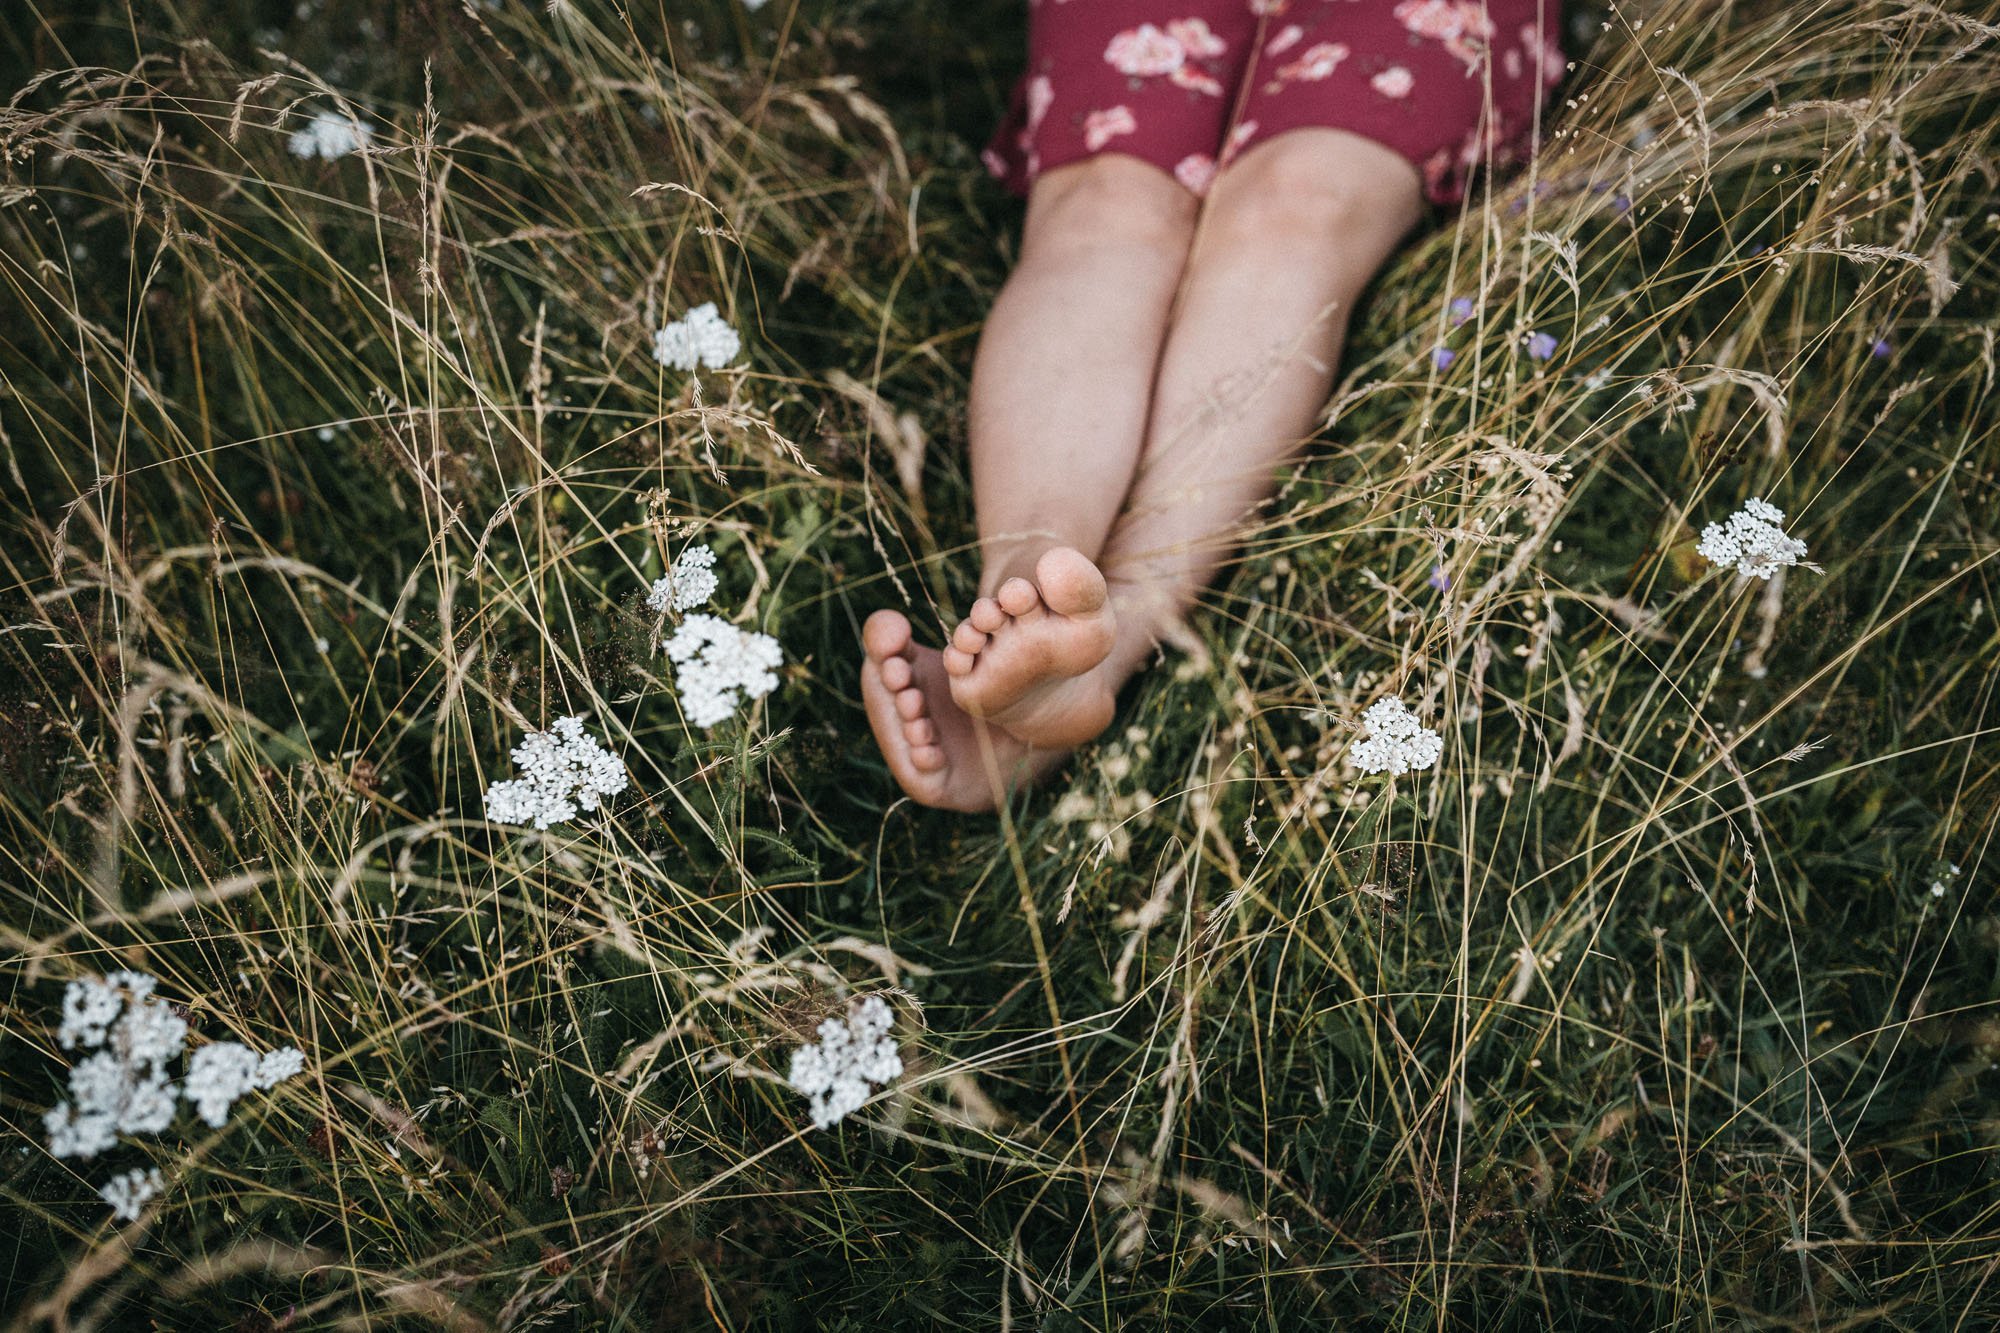 raissa simon photography jule florian feldberg schwarzwald 046 - Jule + Florian